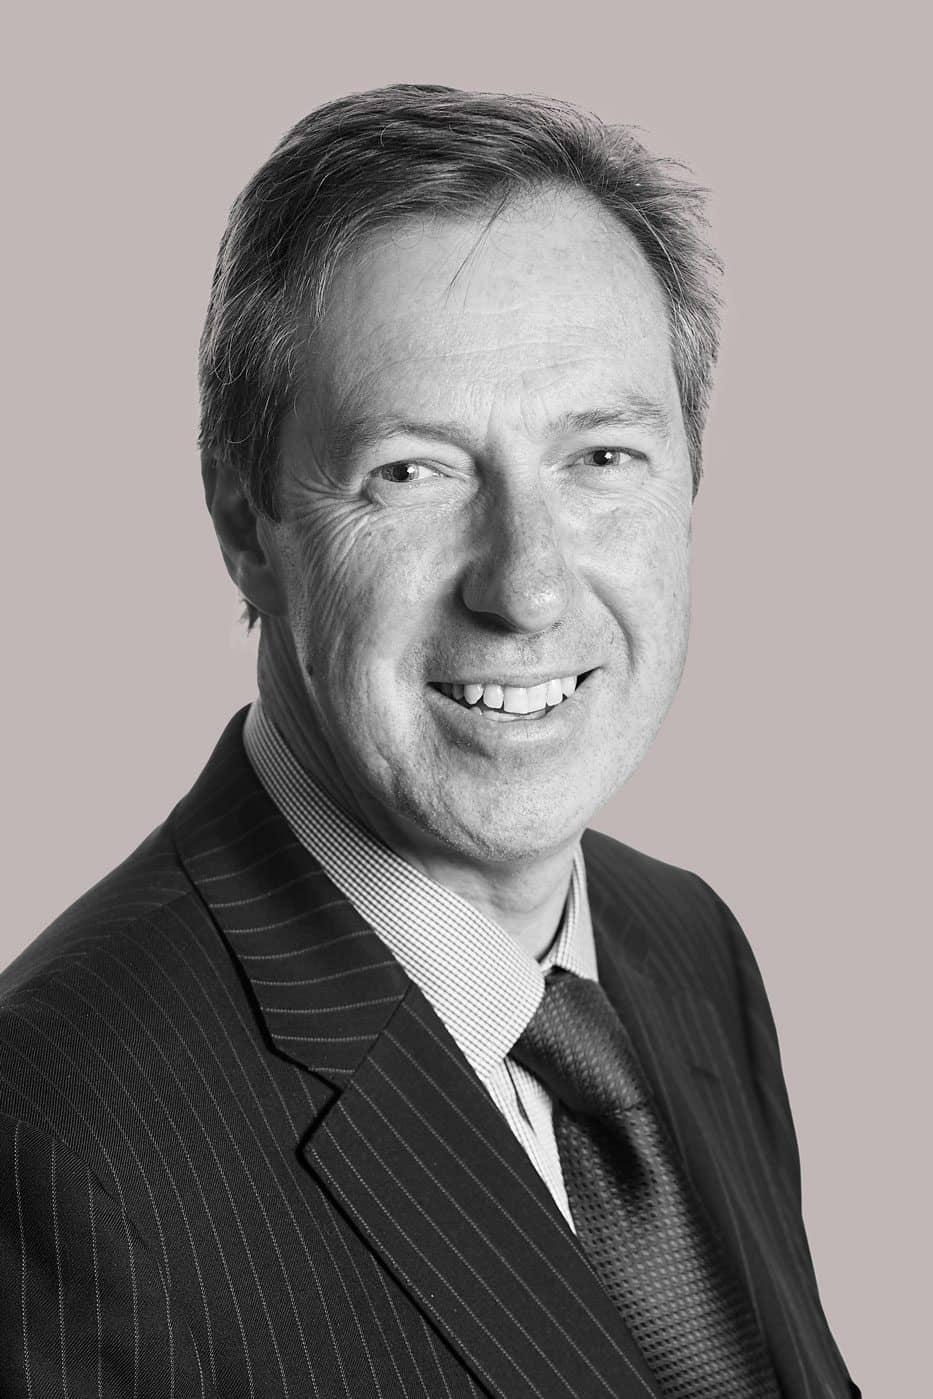 Chris-Hart - Wollens Chief Executive Devon